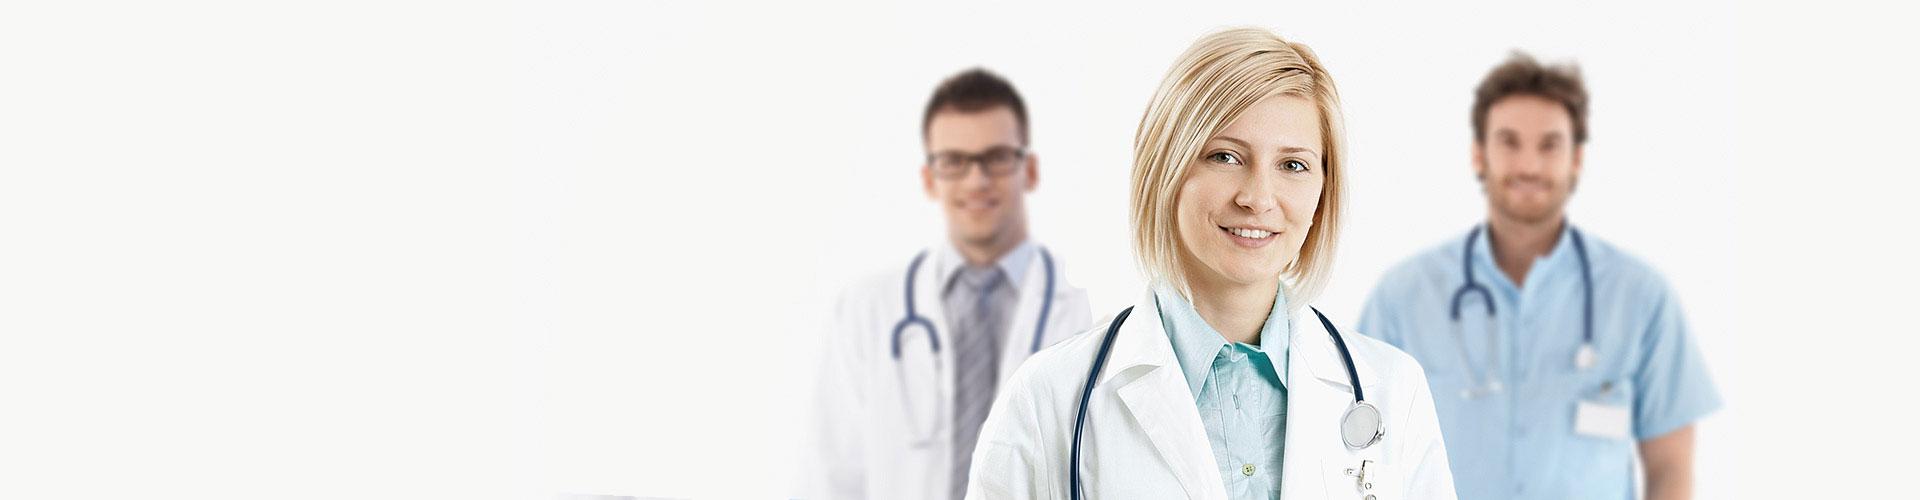 mua bảo hiểm y tế